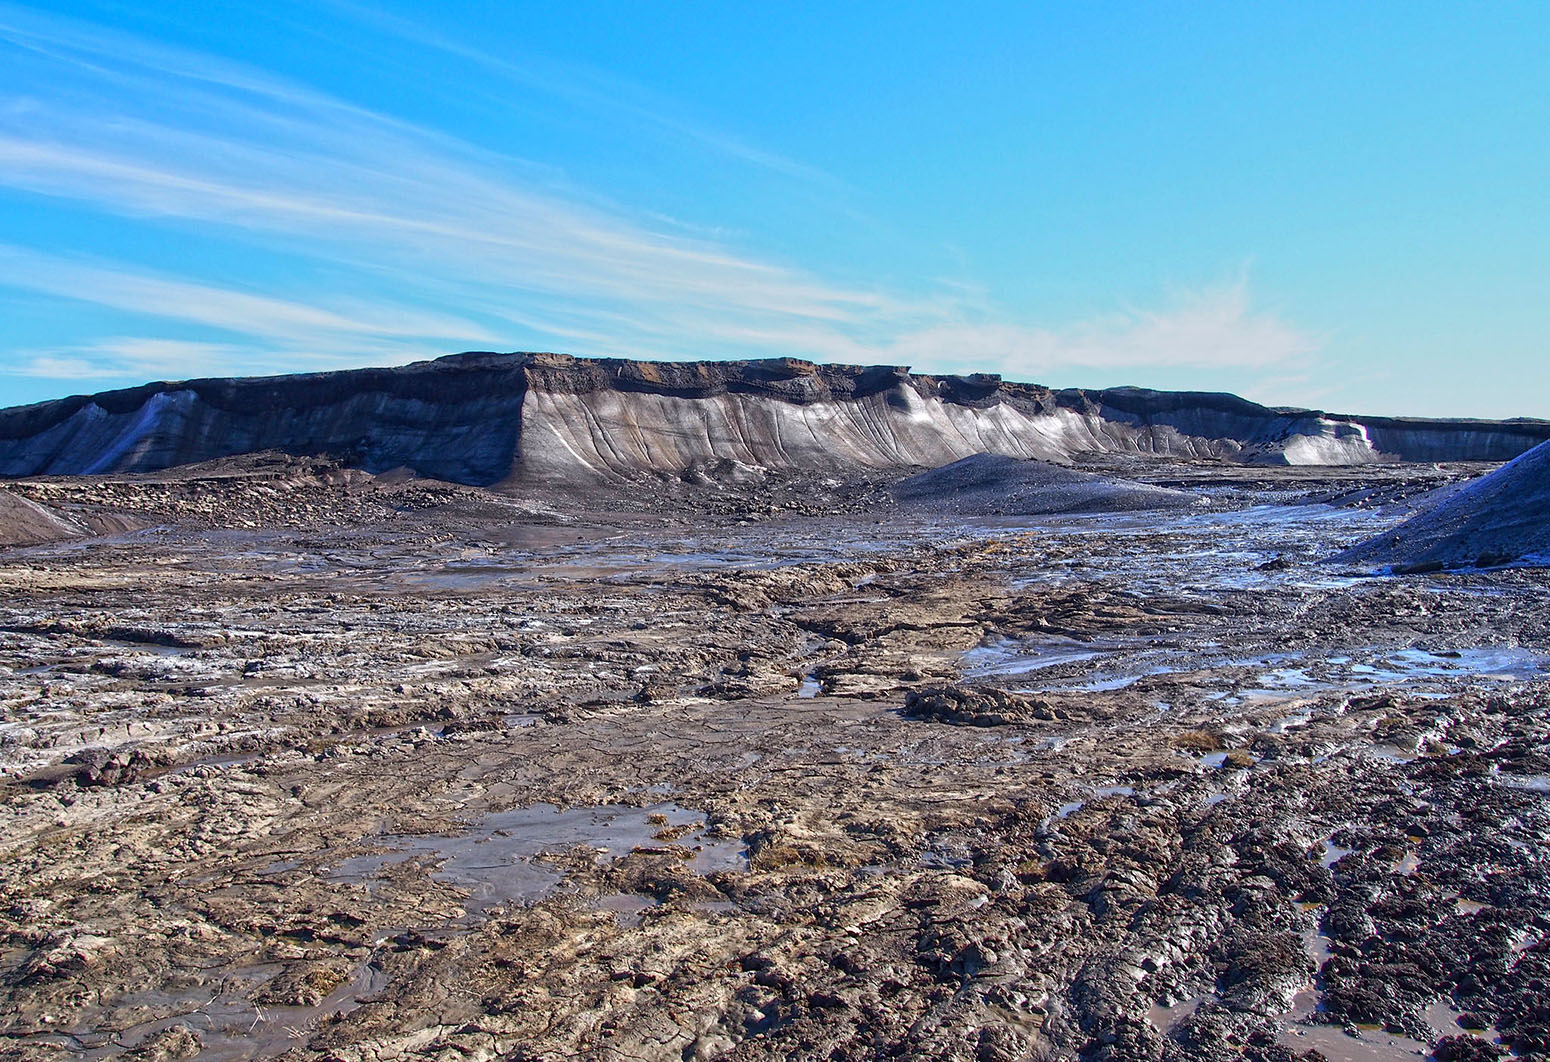 Retrogressive thaw slump in the 2014 study area on Forsheim Peninsula, Ellesmere Island, Canada. Credit: UBC Micrometeorology (CC BY 4.0).